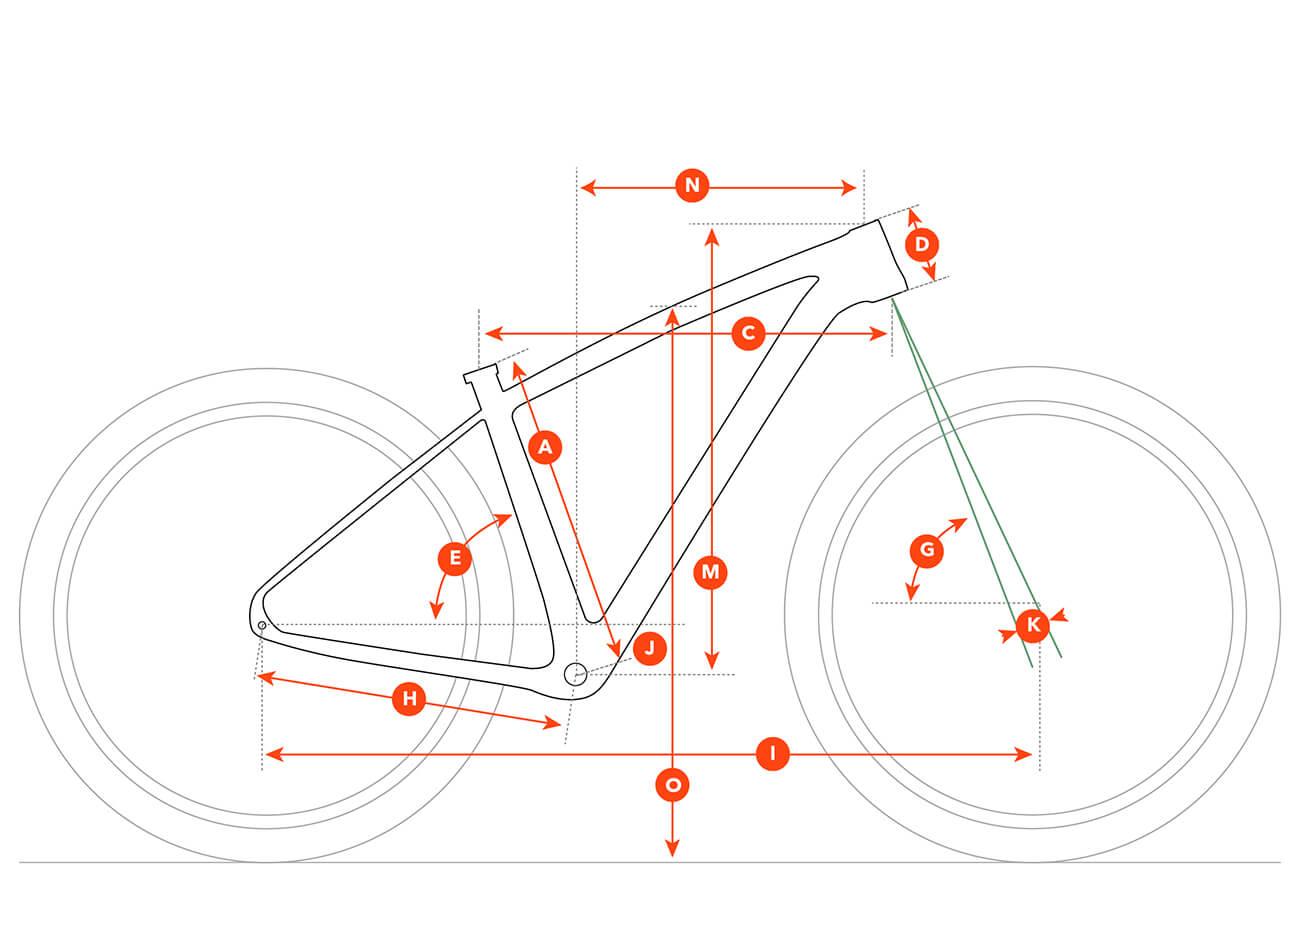 mxz-geo.jpg diagram